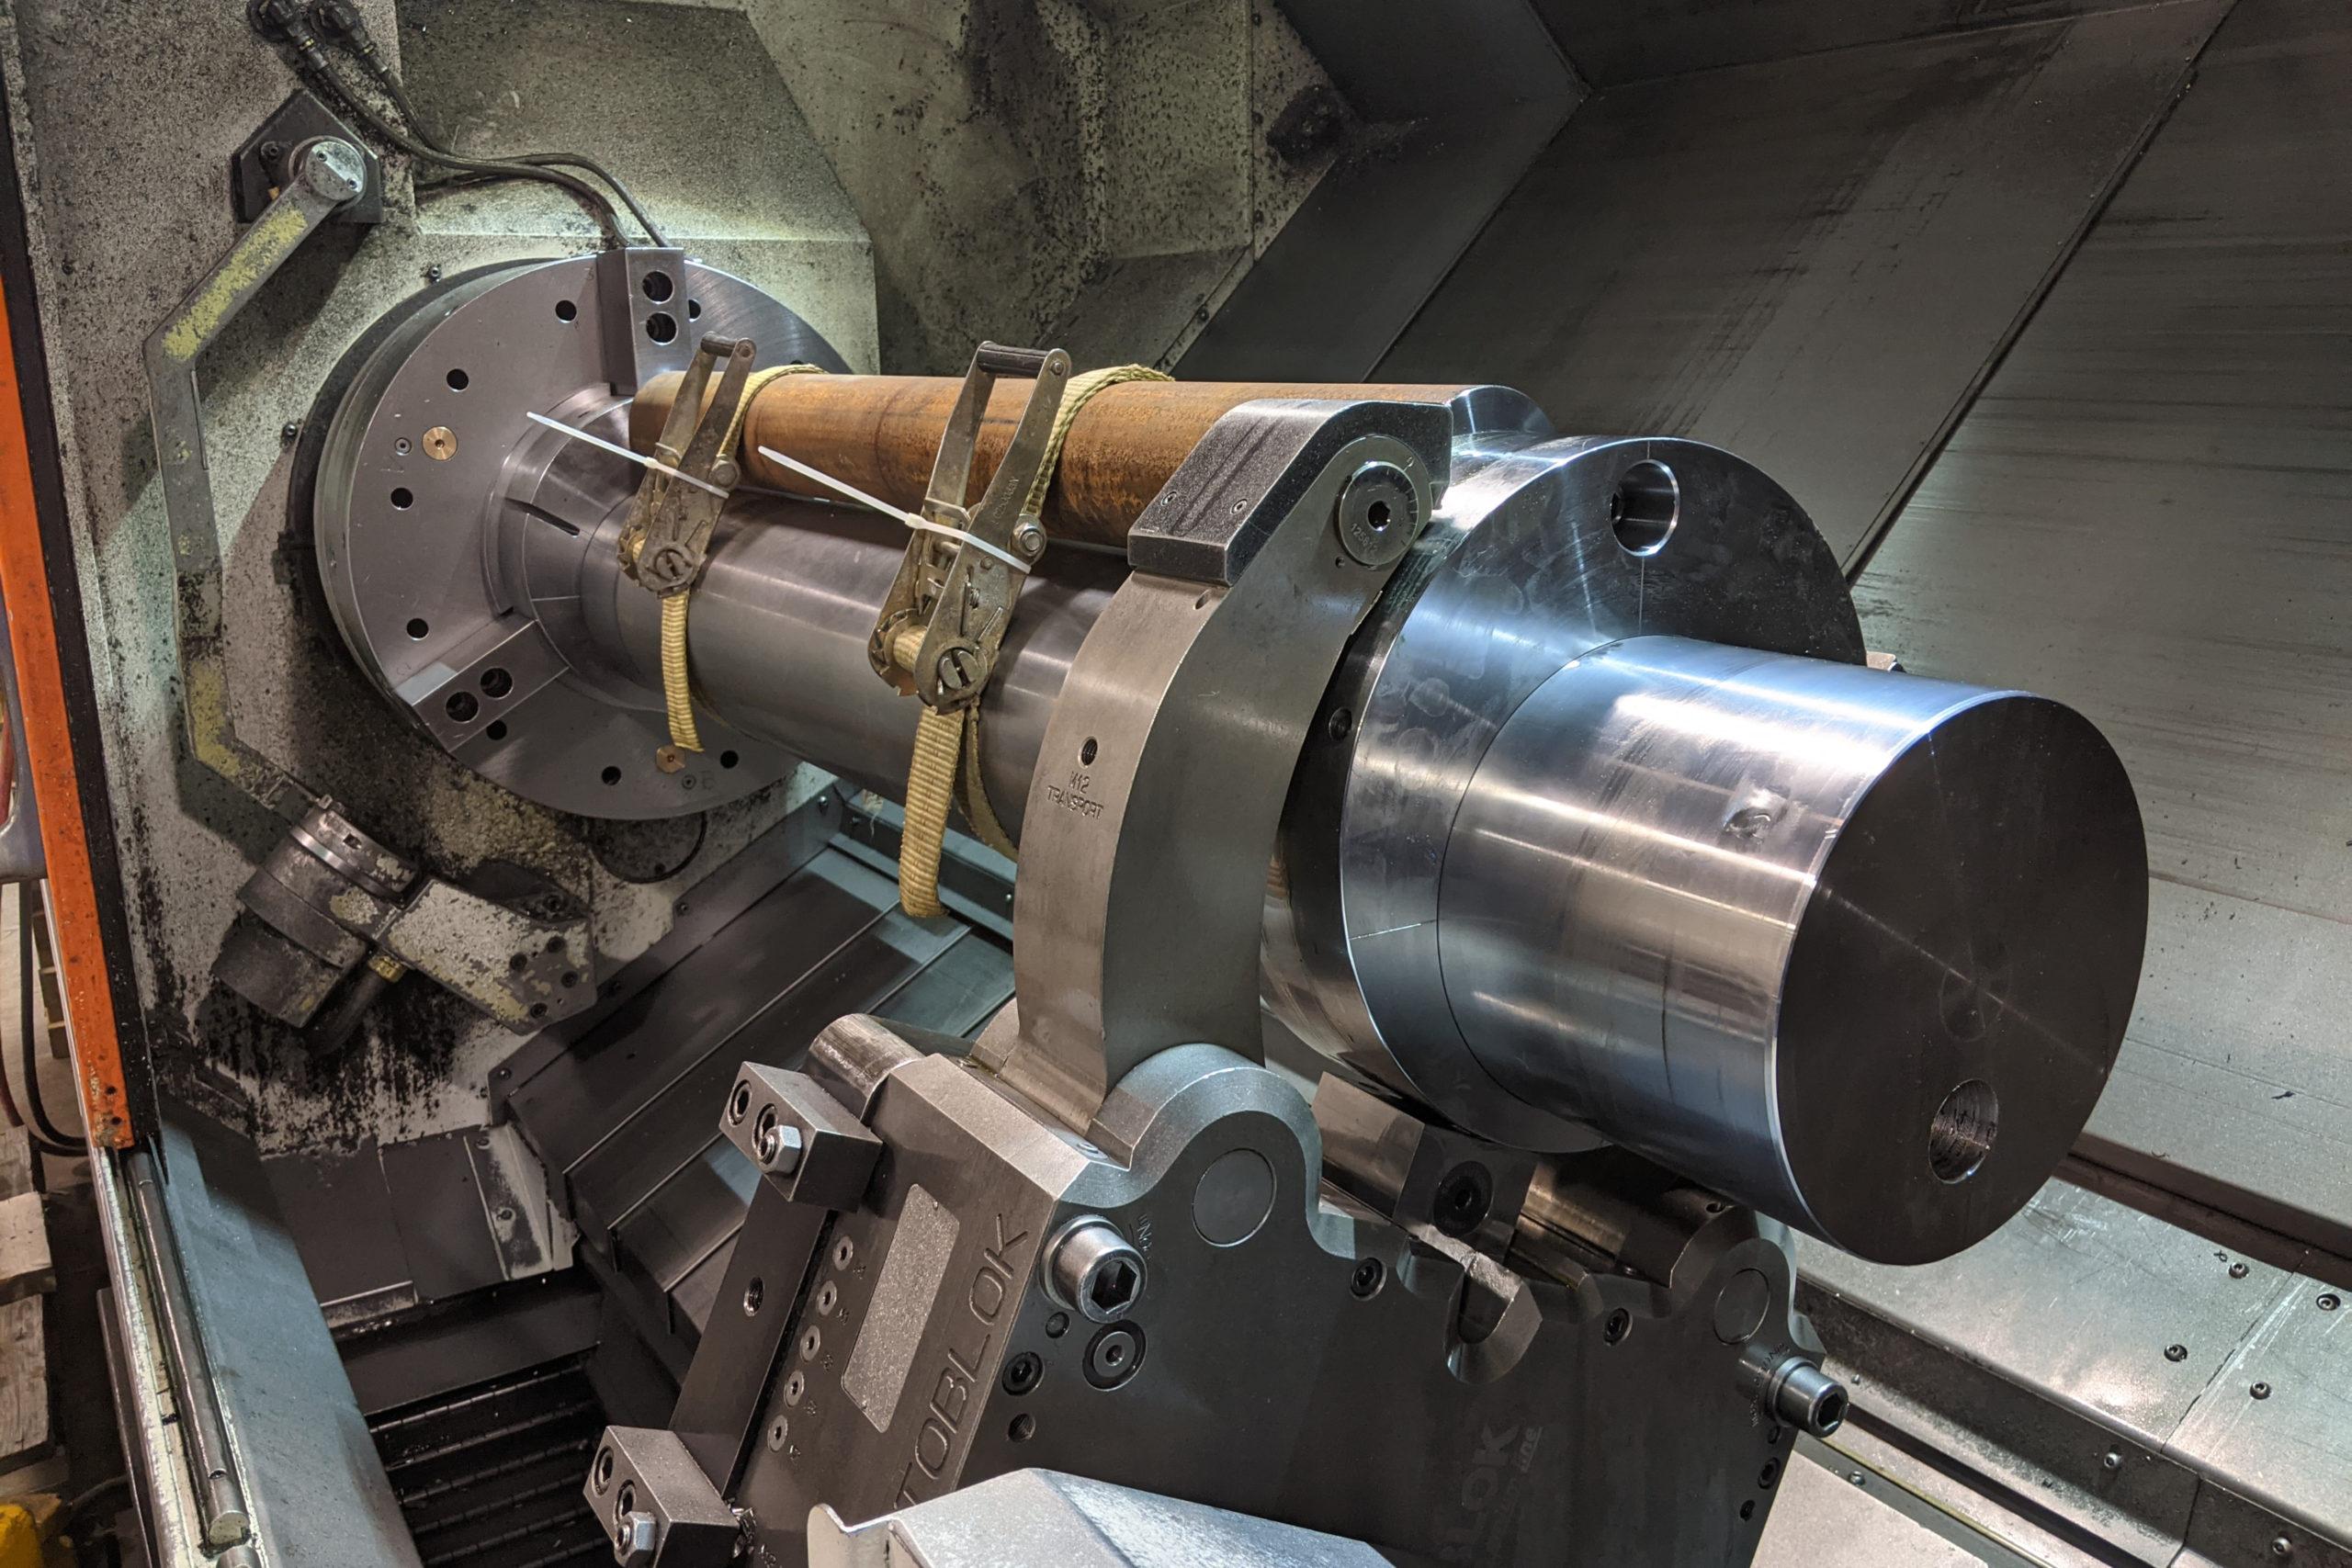 63-inch-long, 8-inch-diameter mandrel component